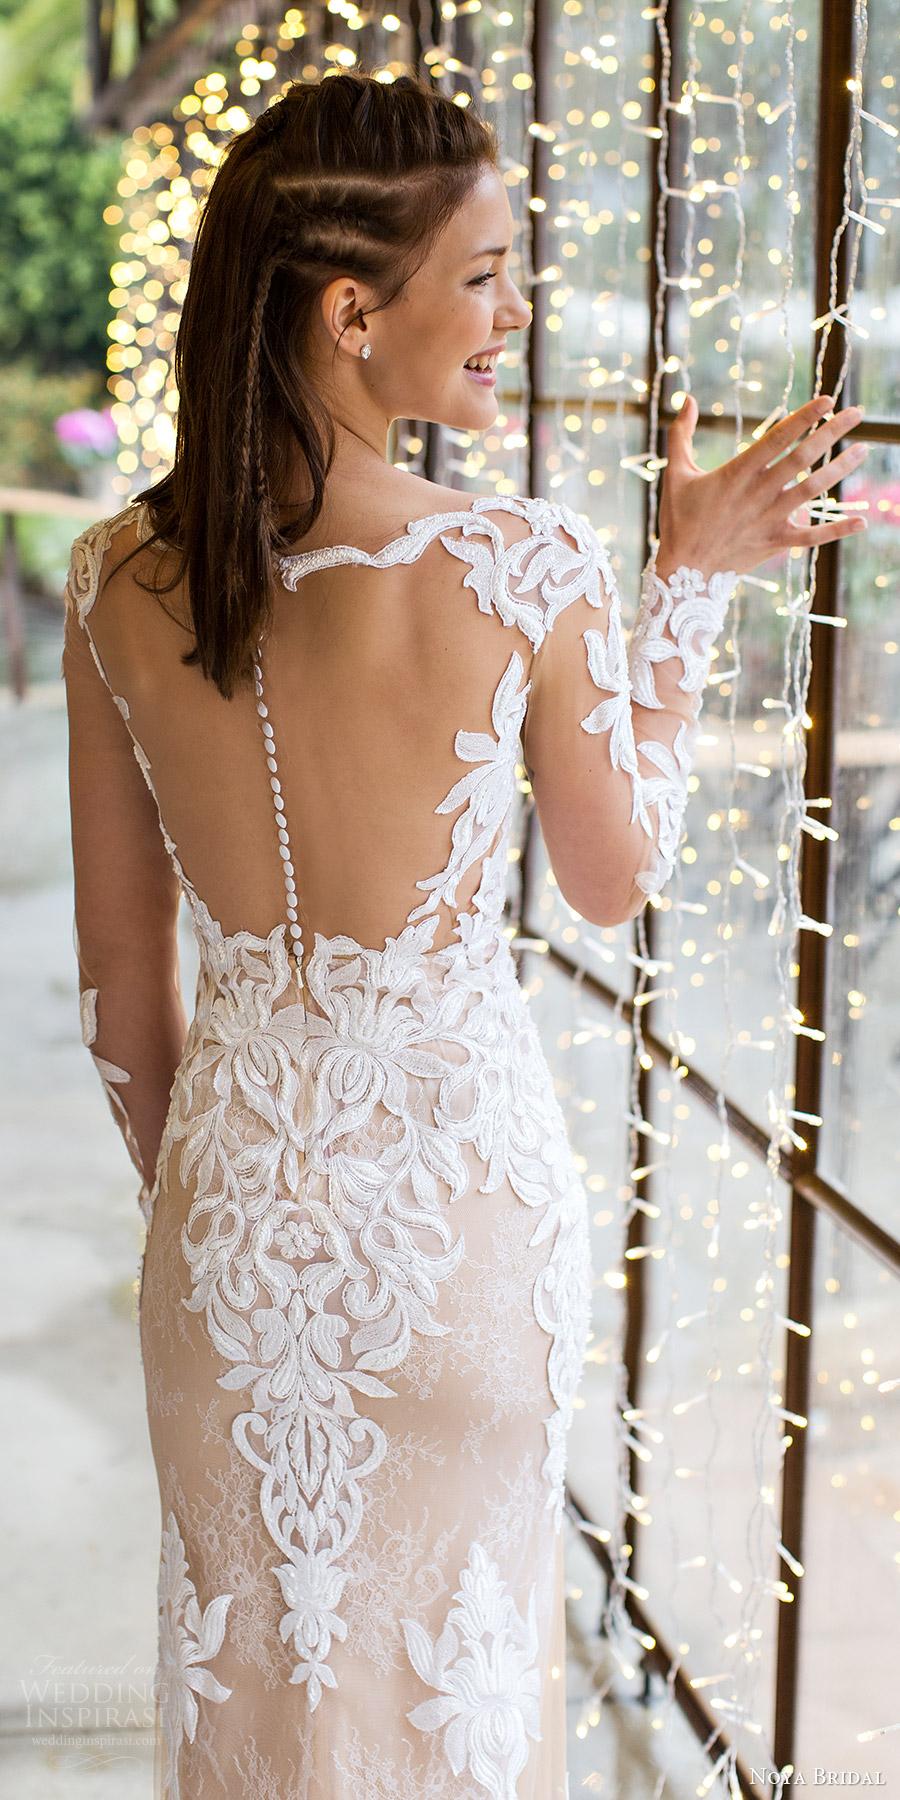 noya bridal 2016 illusion long sleeve scalloped sweetheart illusion jewel sheath wedding dress (1201) zbv illusionback train elegant